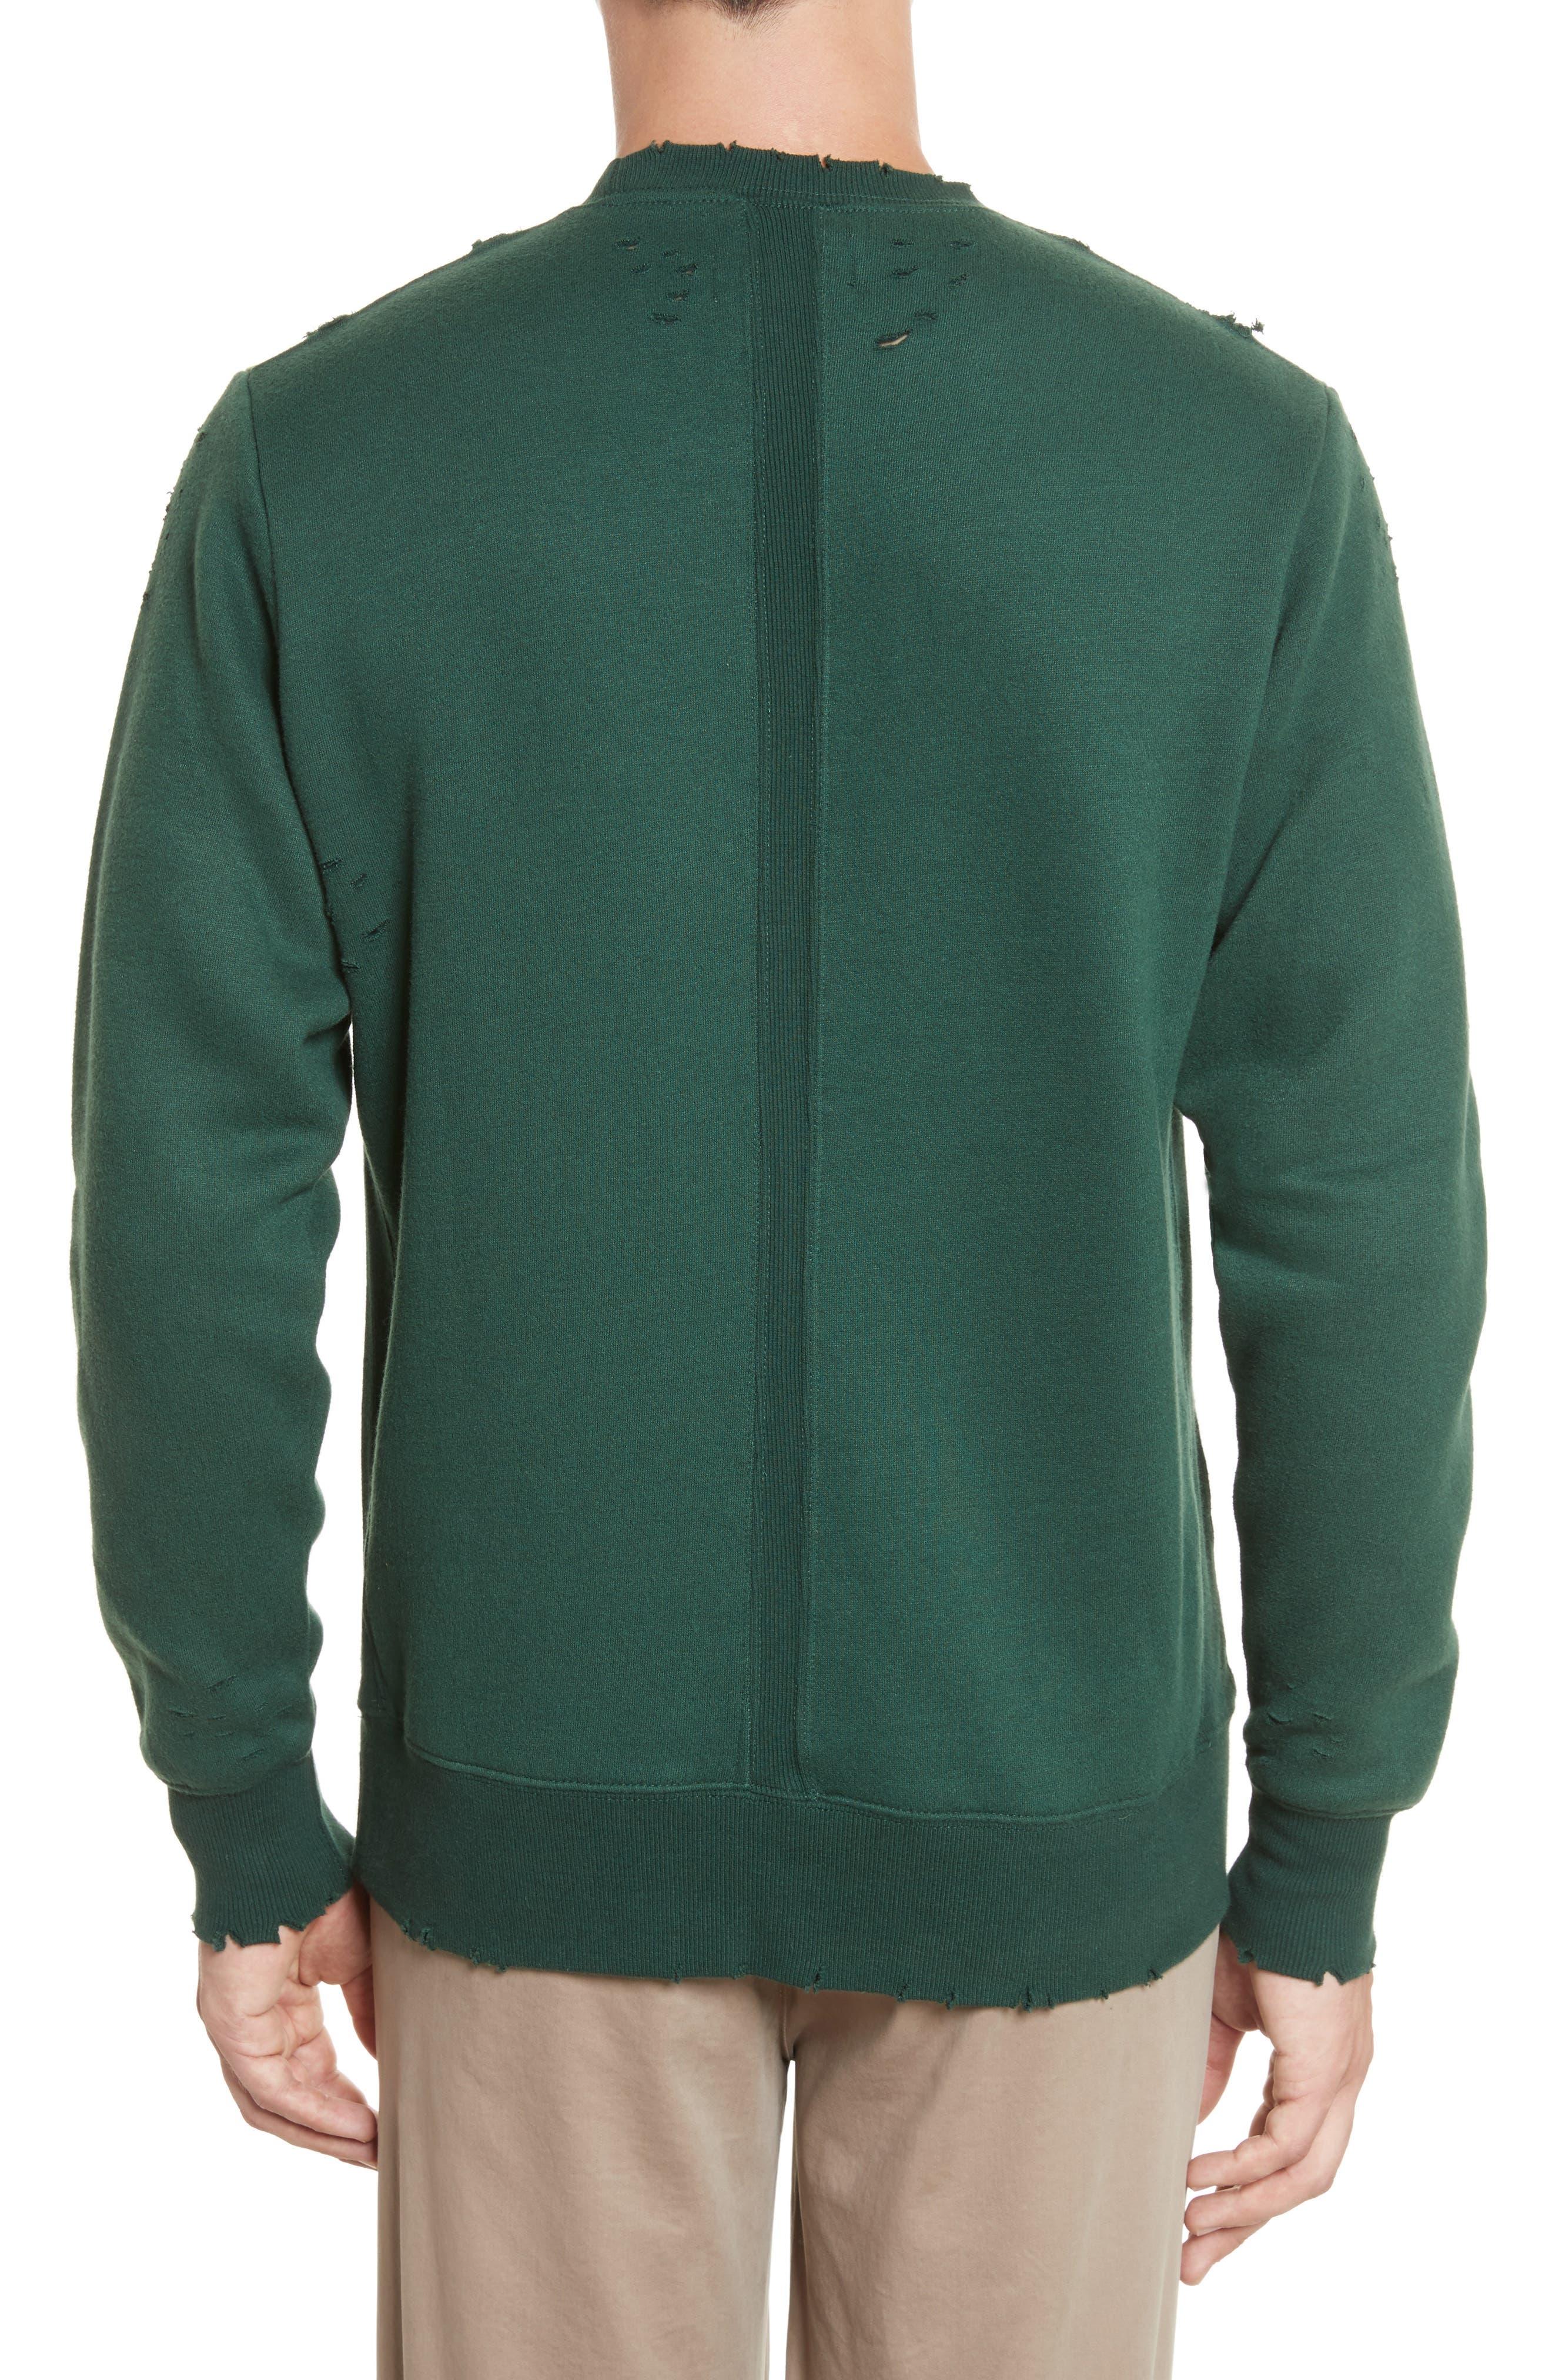 Alternate Image 2  - OVADIA & SONS Crewneck Sweater